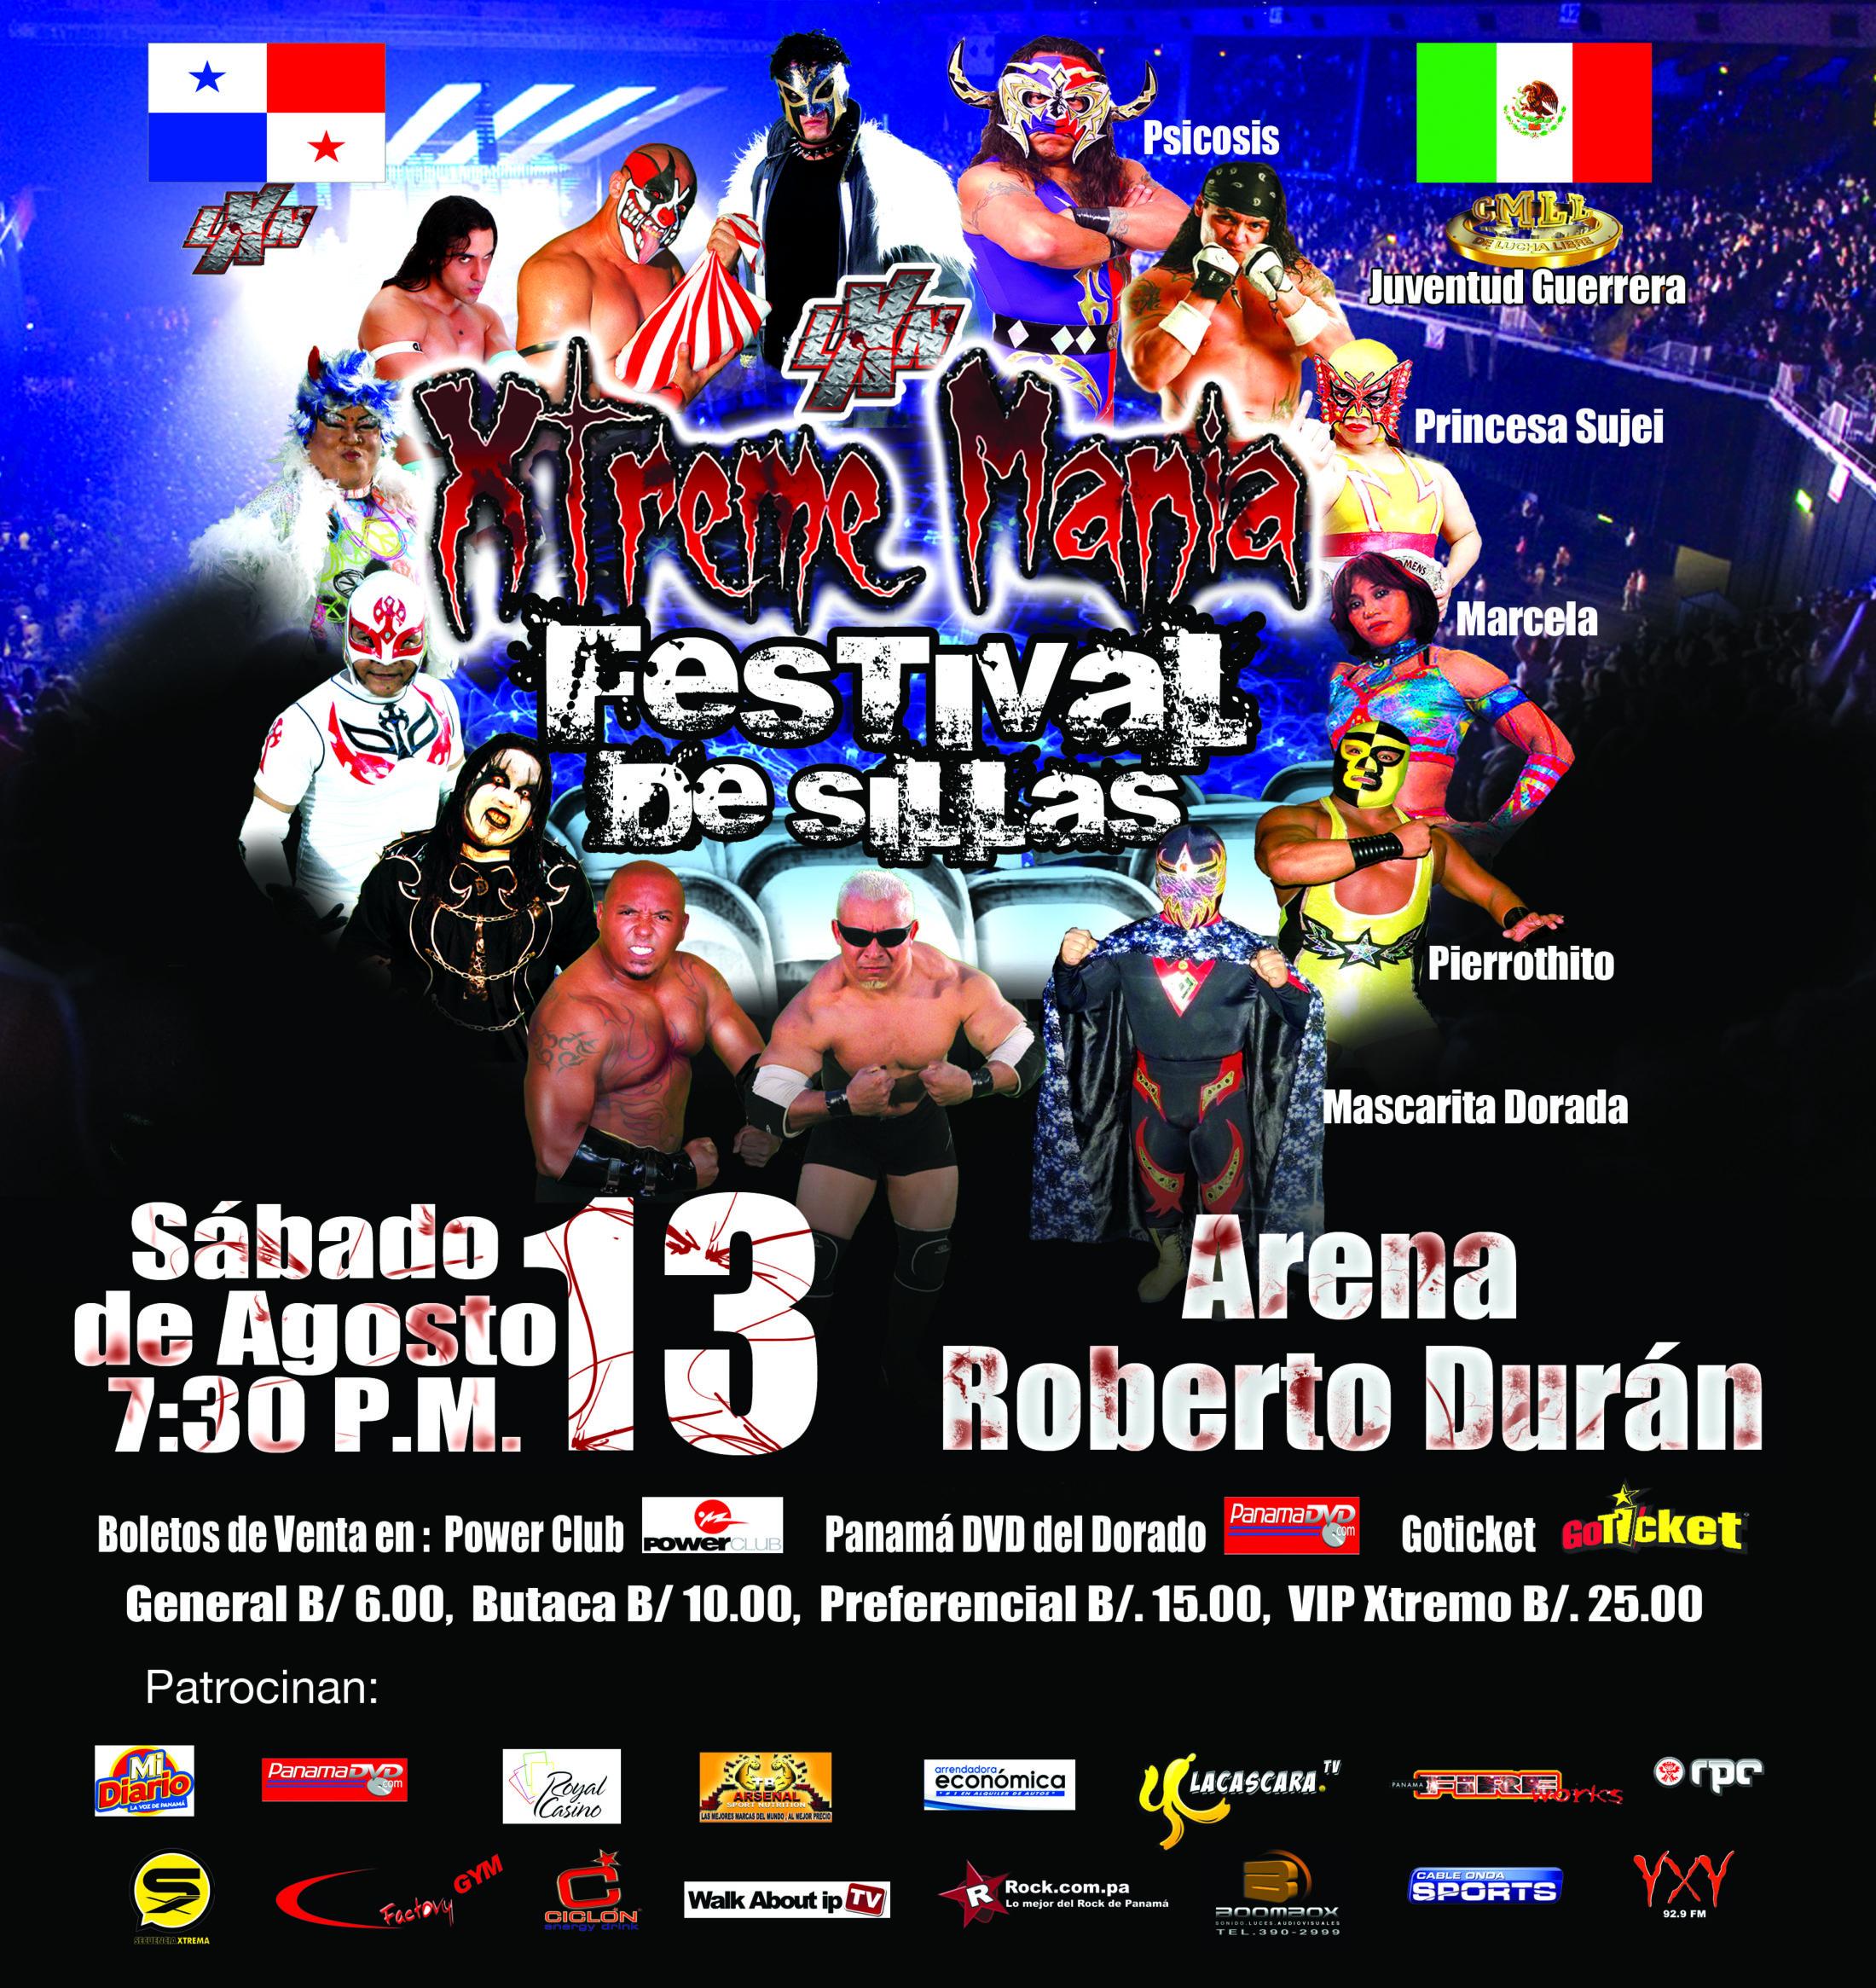 LXN Presenta Xtremania Festival de Sillas 2011